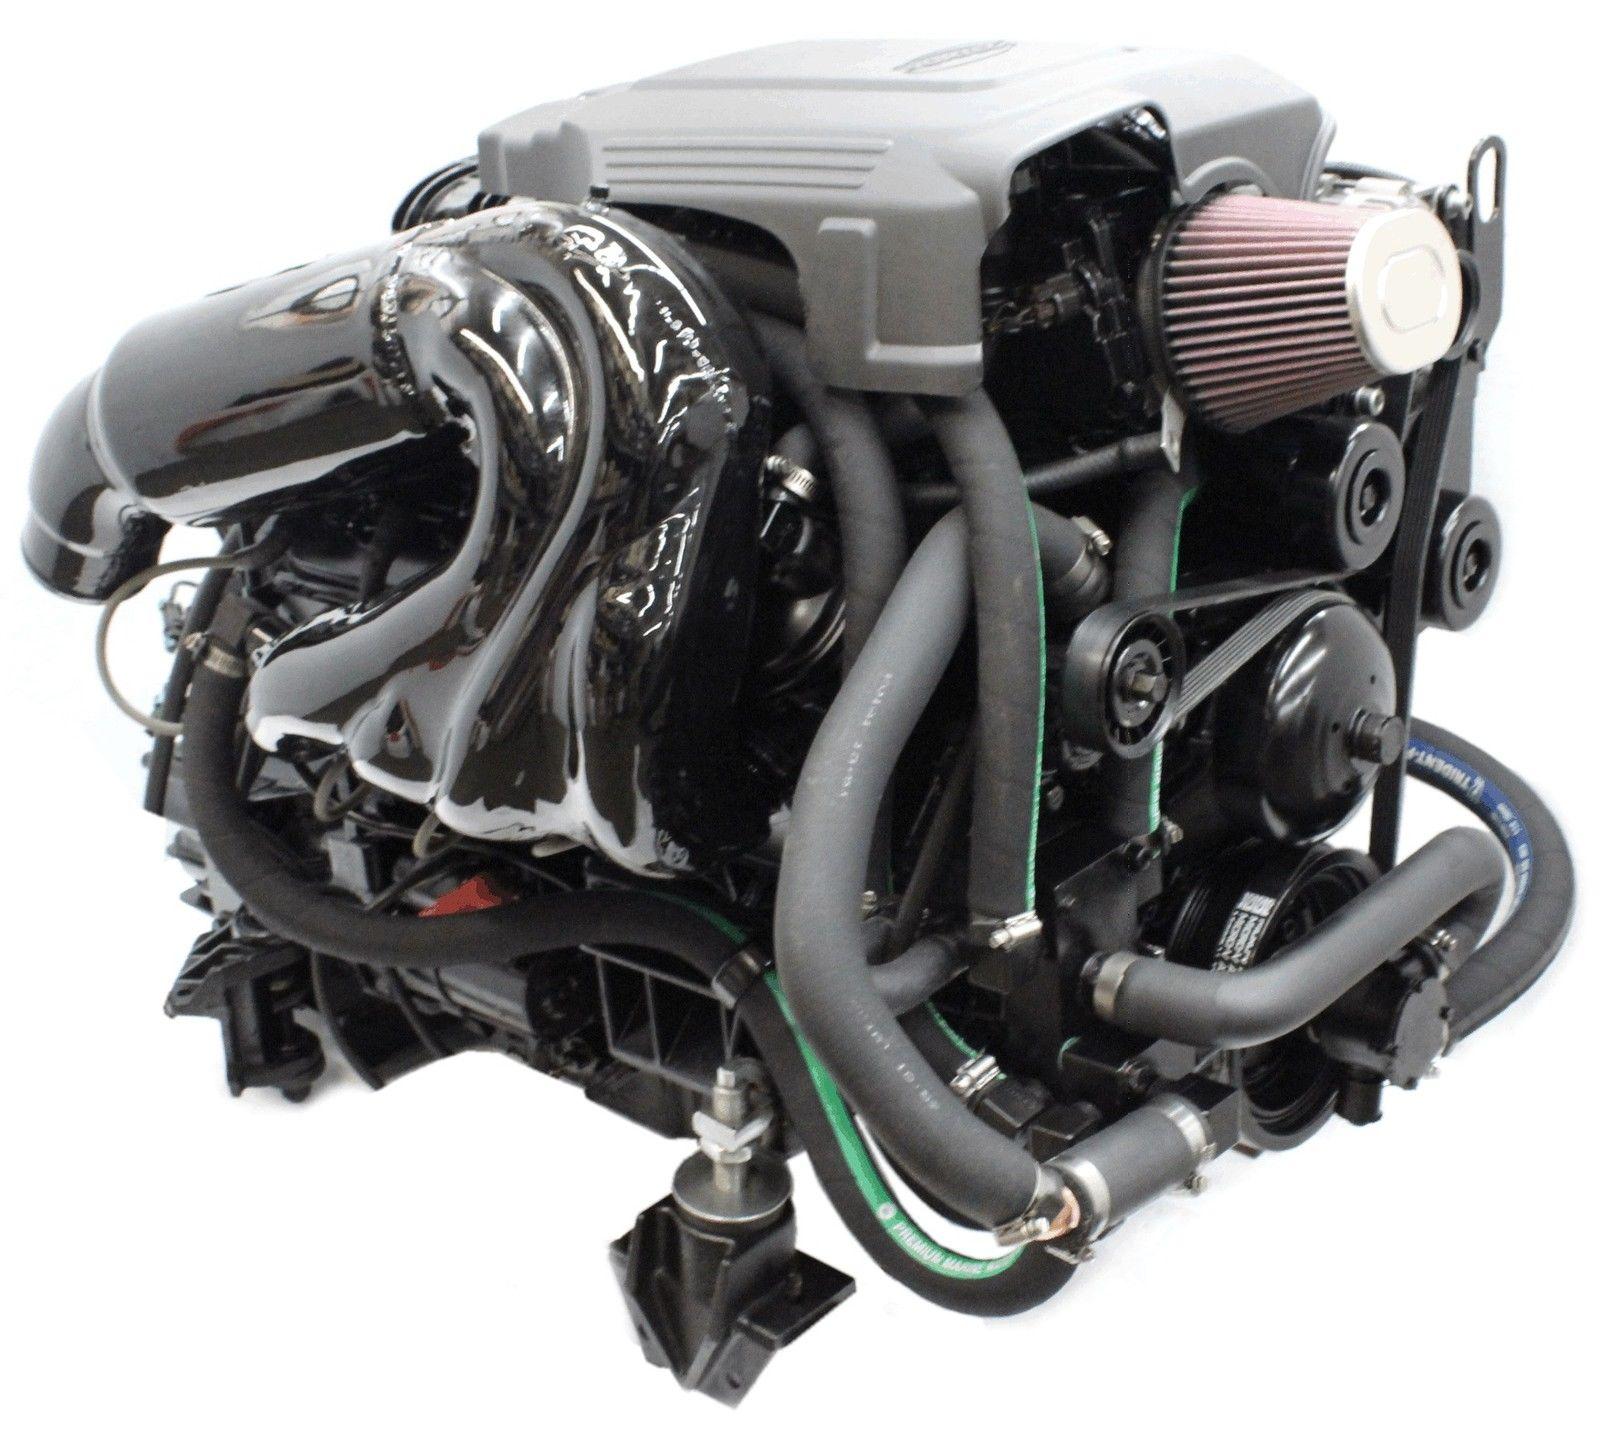 New Indmar 6 0l Vortec Inboard Complete Boat Engine  U0026 Zf